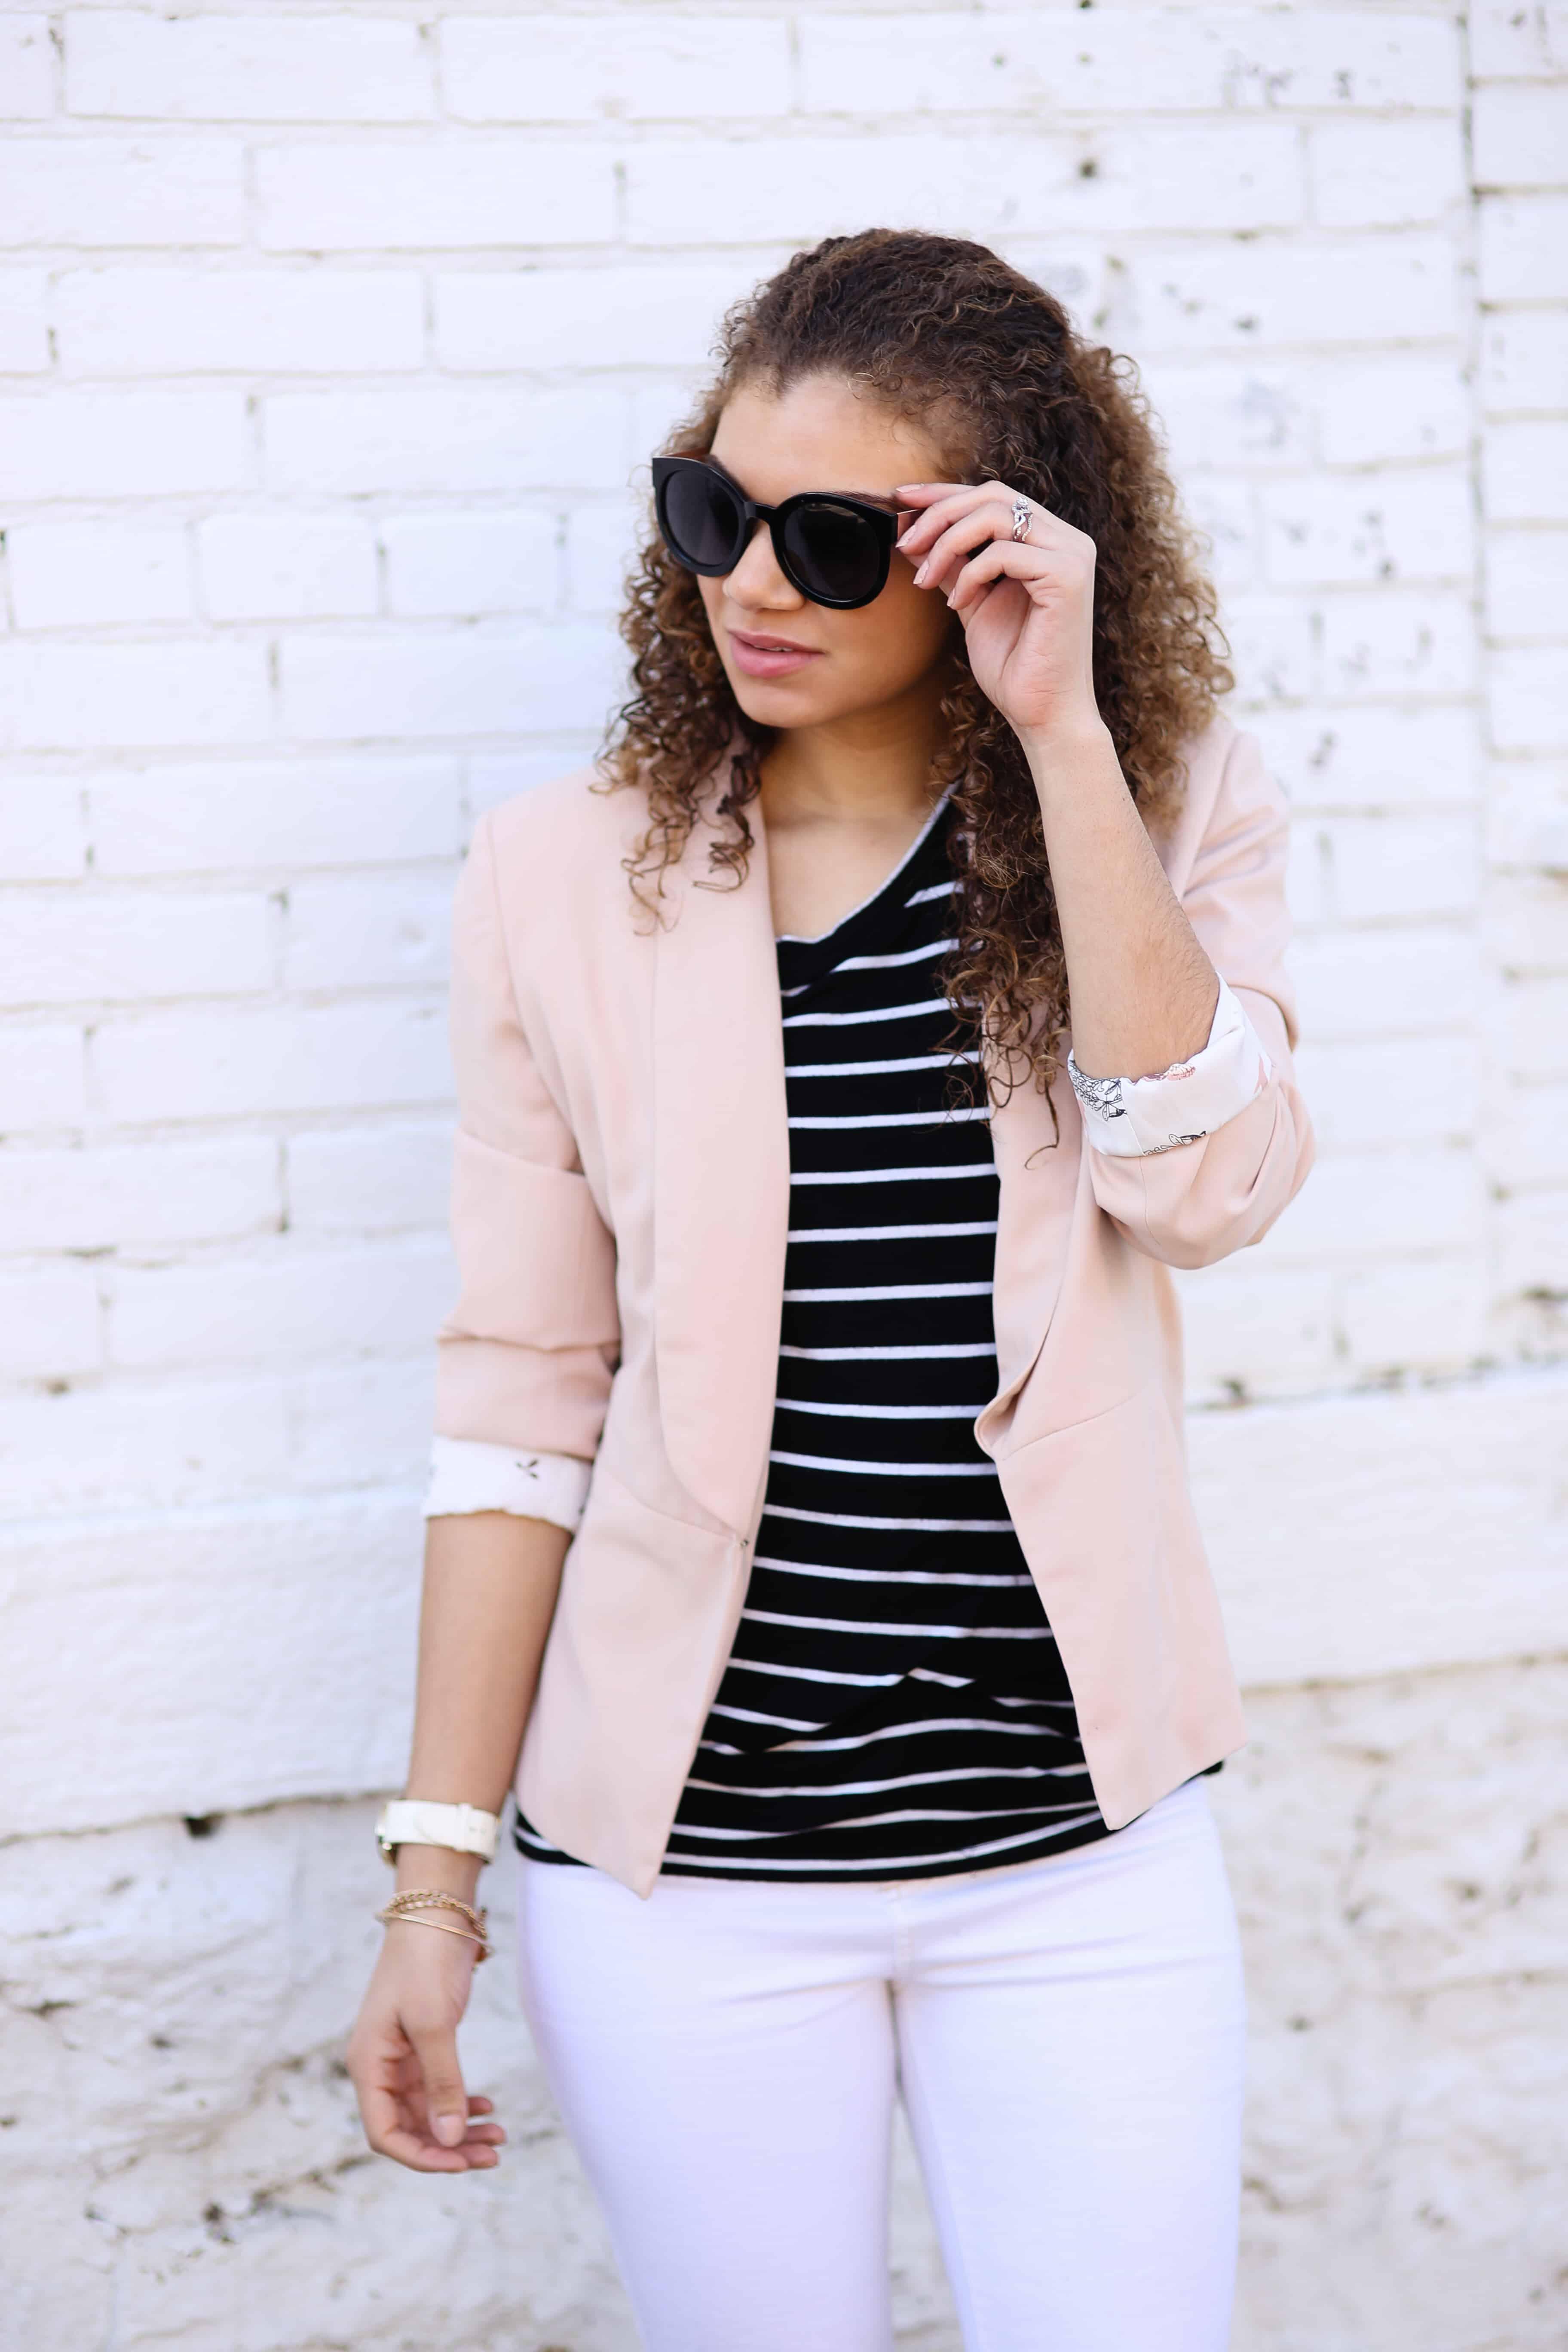 https://www.mychicobsession.com/8-ways-to-wear-a-denim-skirt-spring-fashion-outfit-ideas/